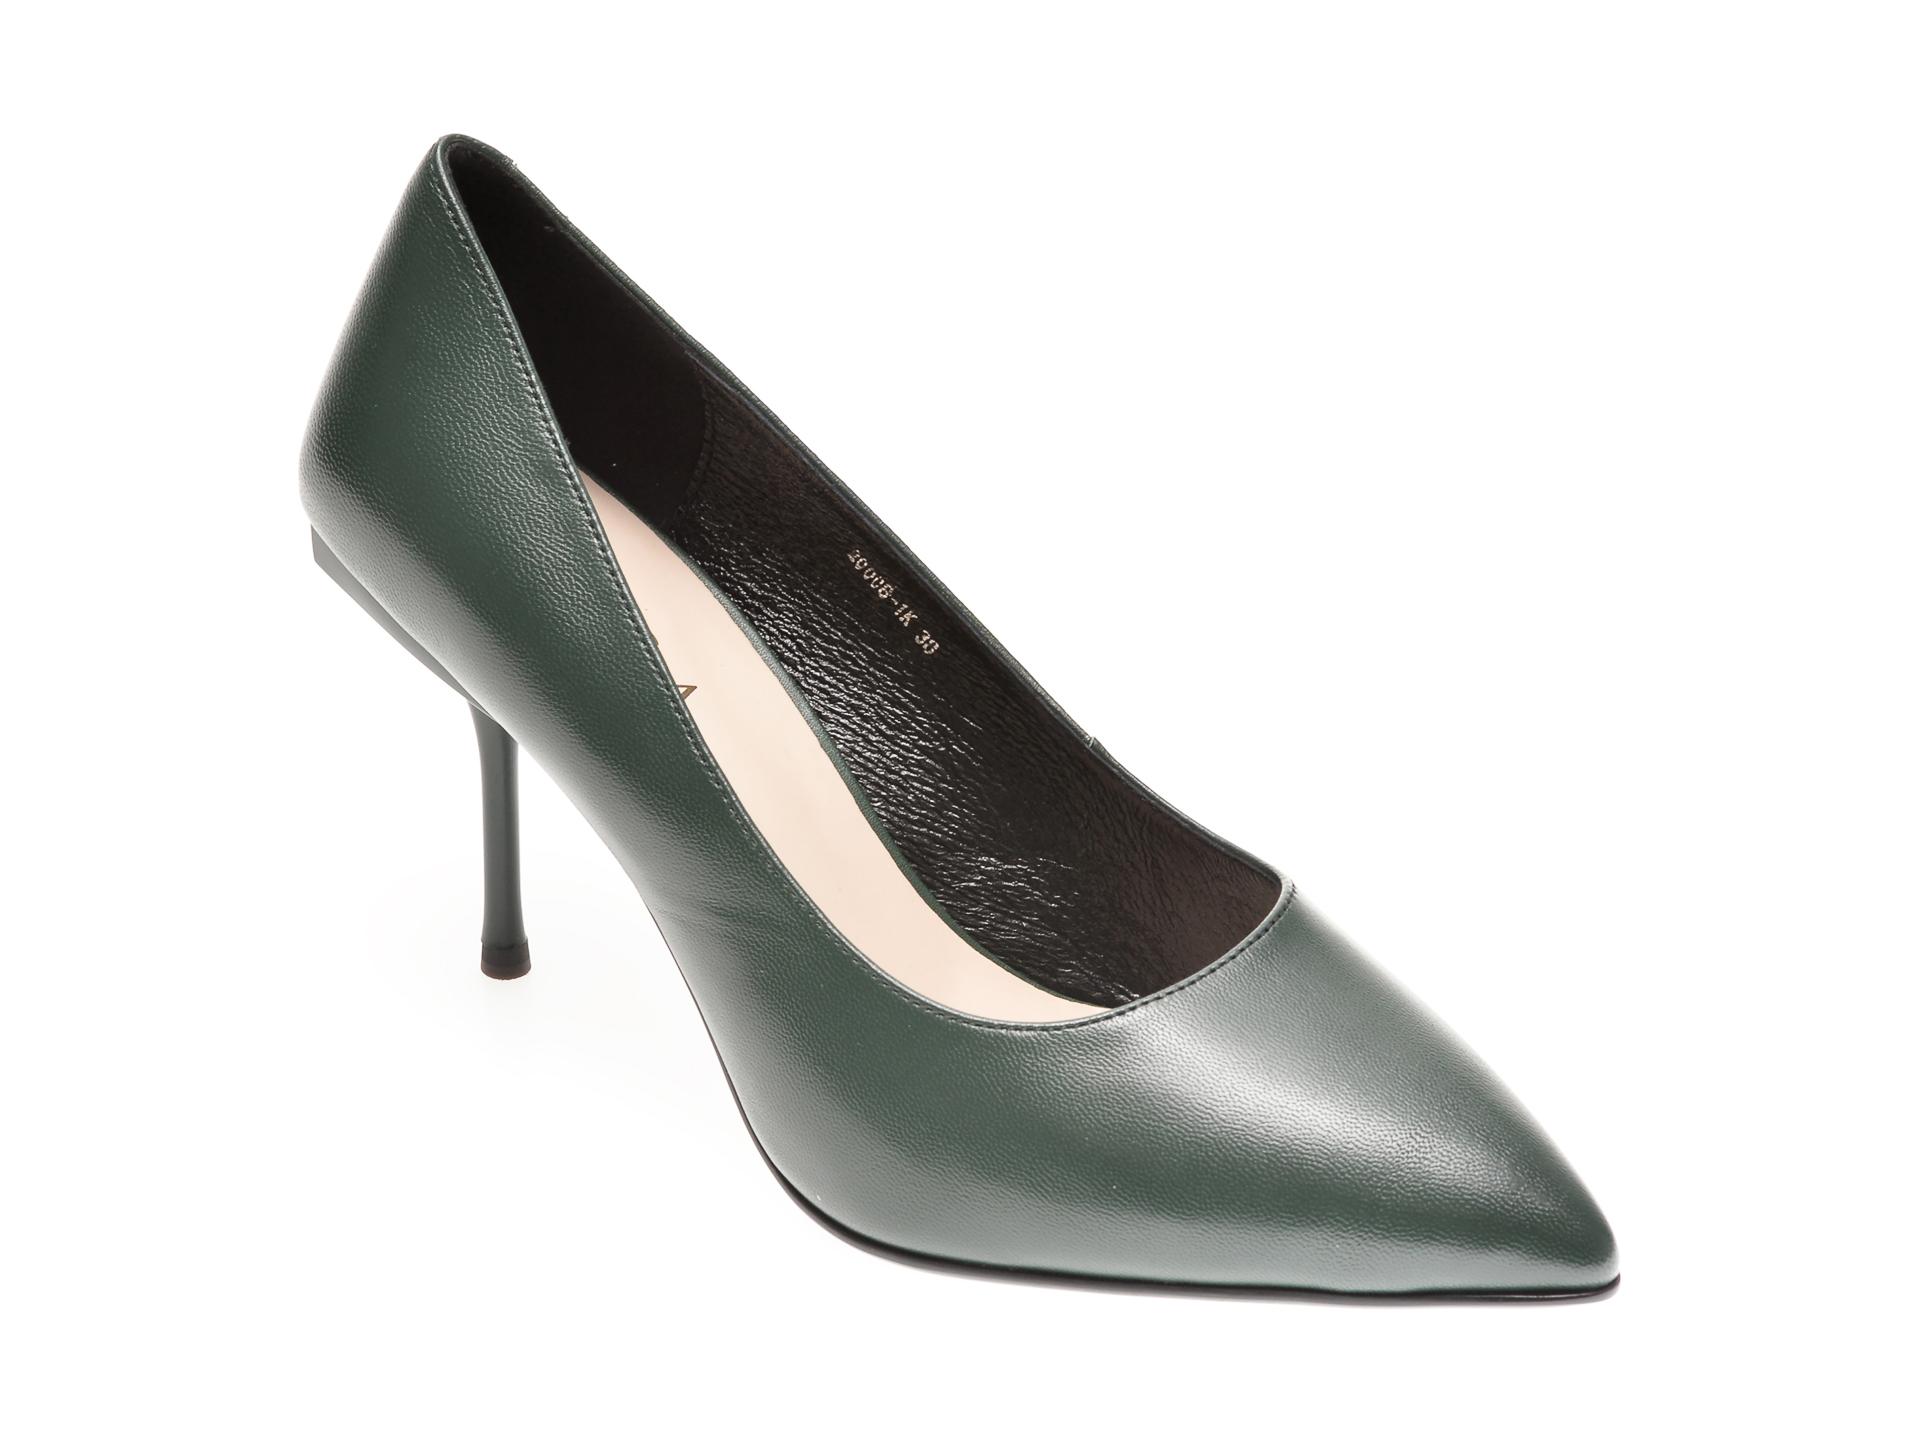 Pantofi EPICA verzi, 20008, din piele naturala imagine otter.ro 2021